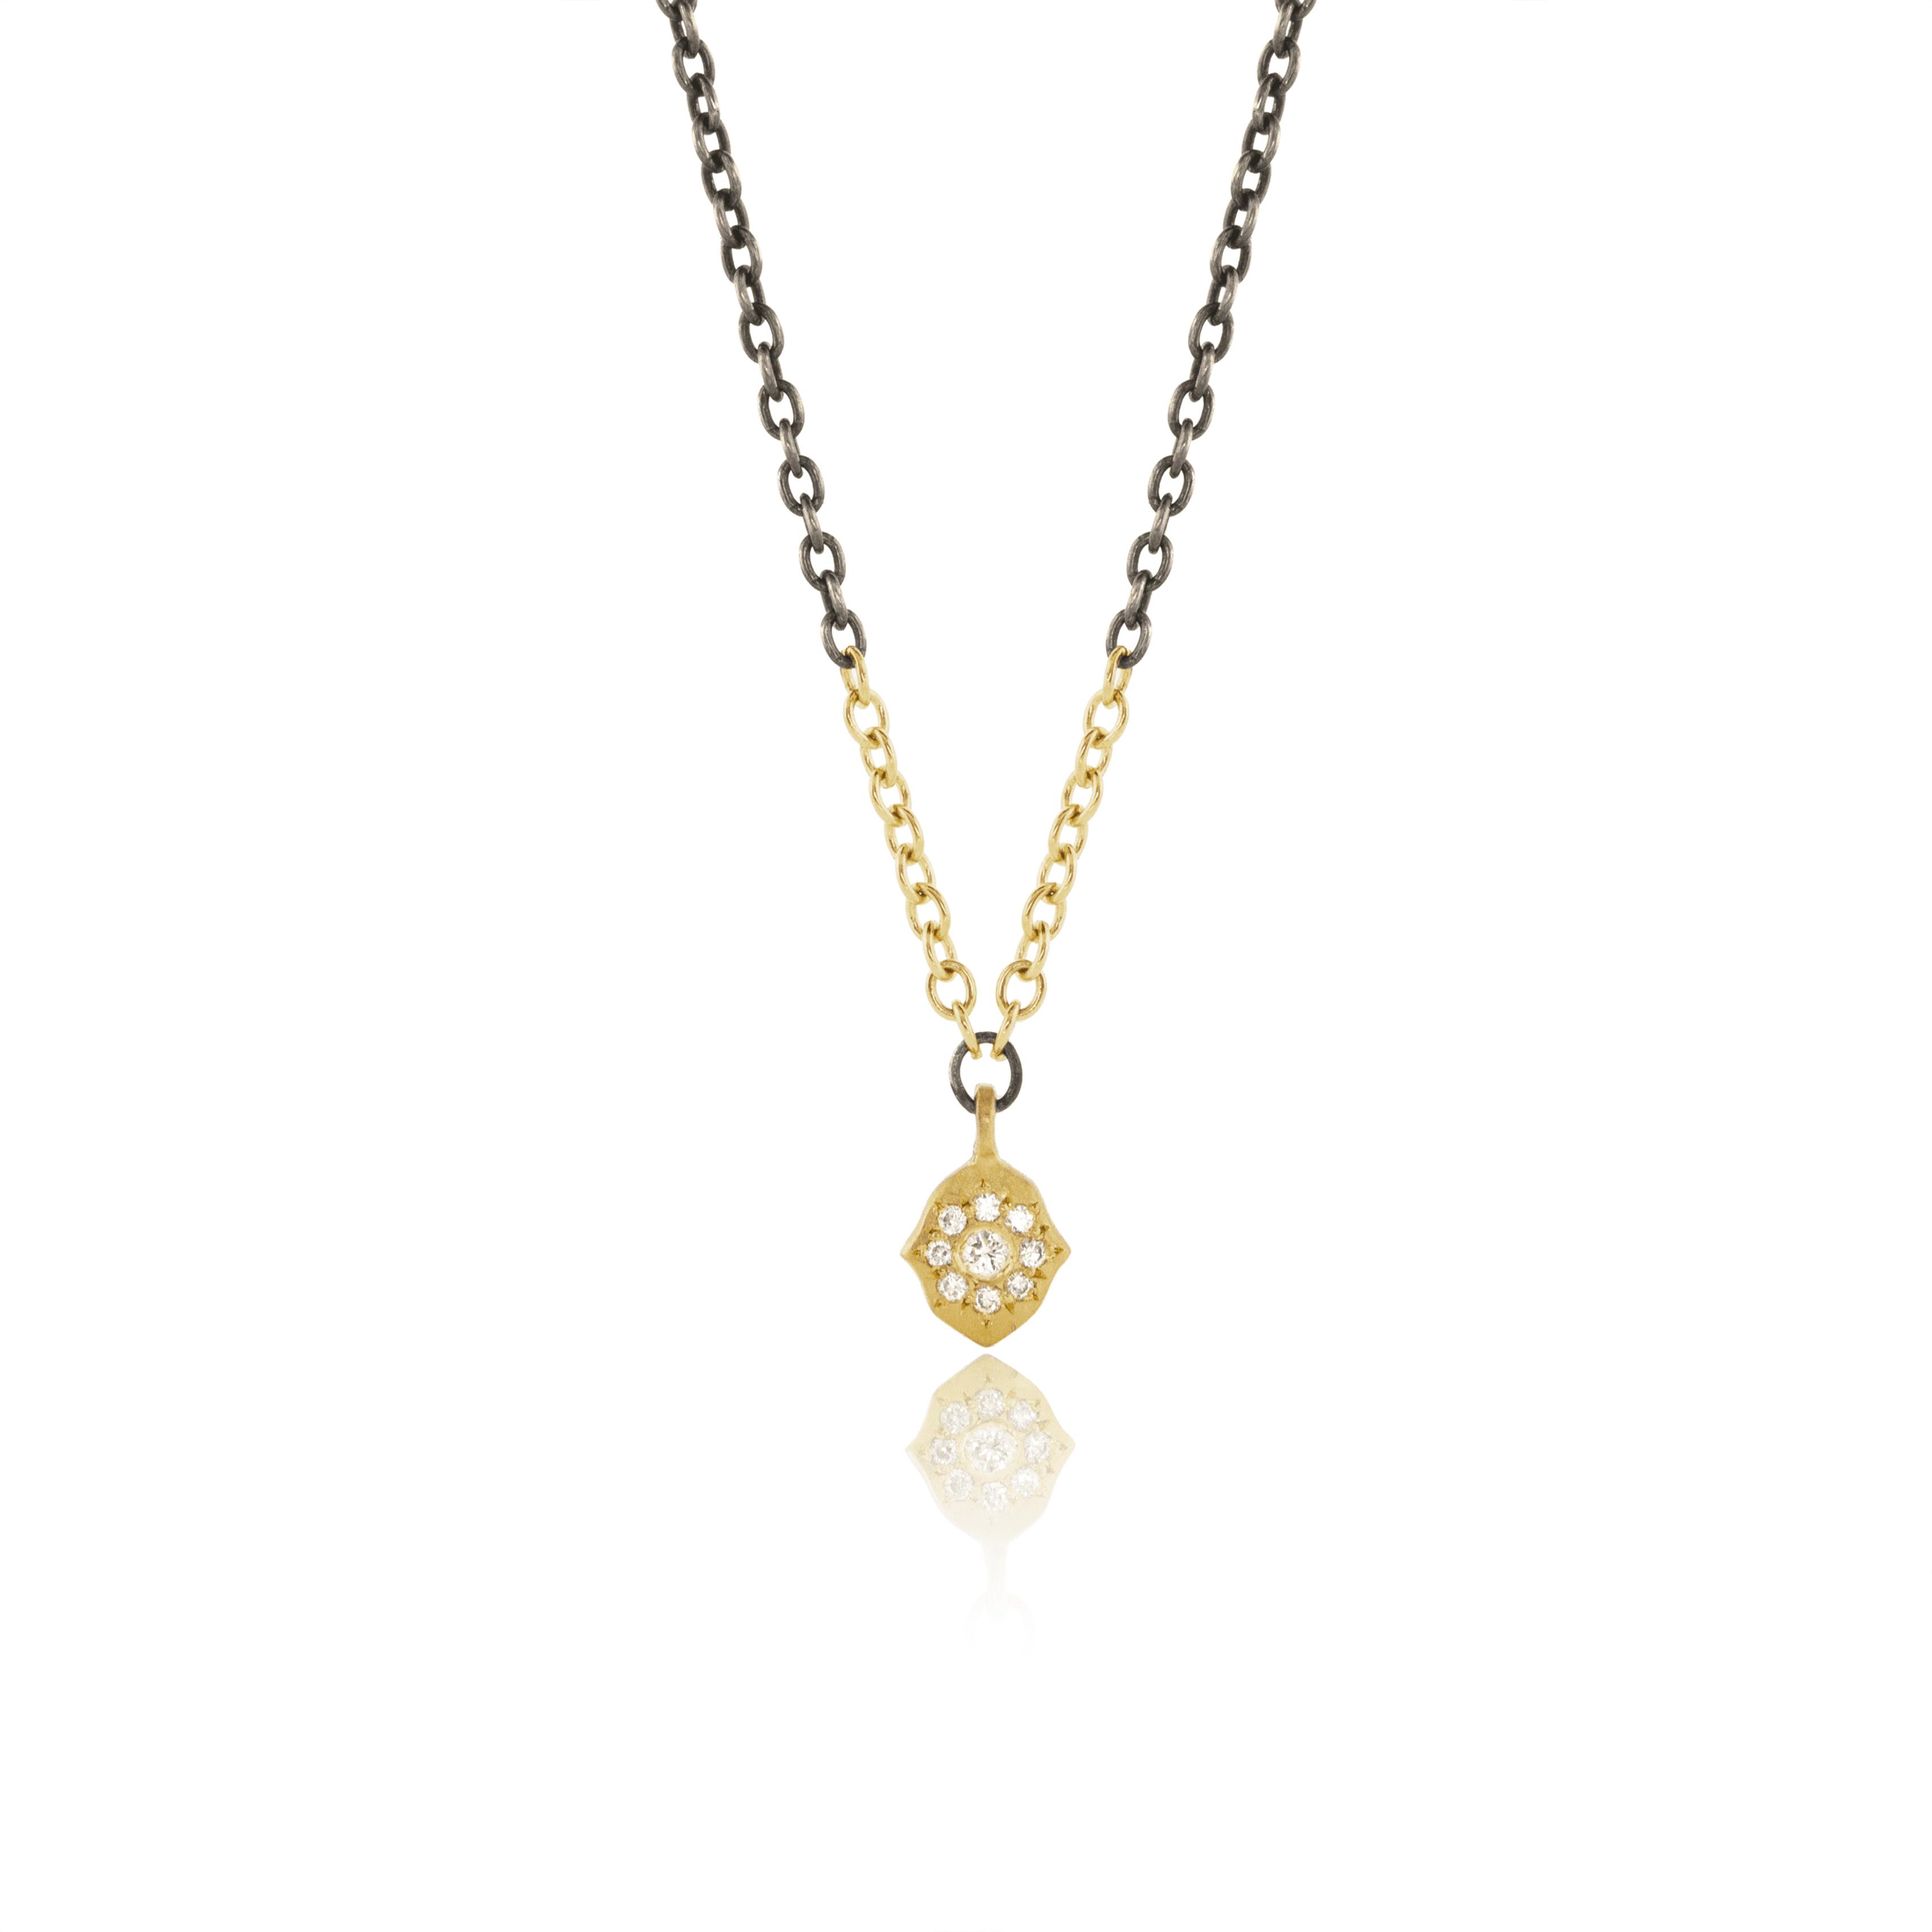 Diamond Neckalce - Adel Chefridi - Mansoor Jewelers